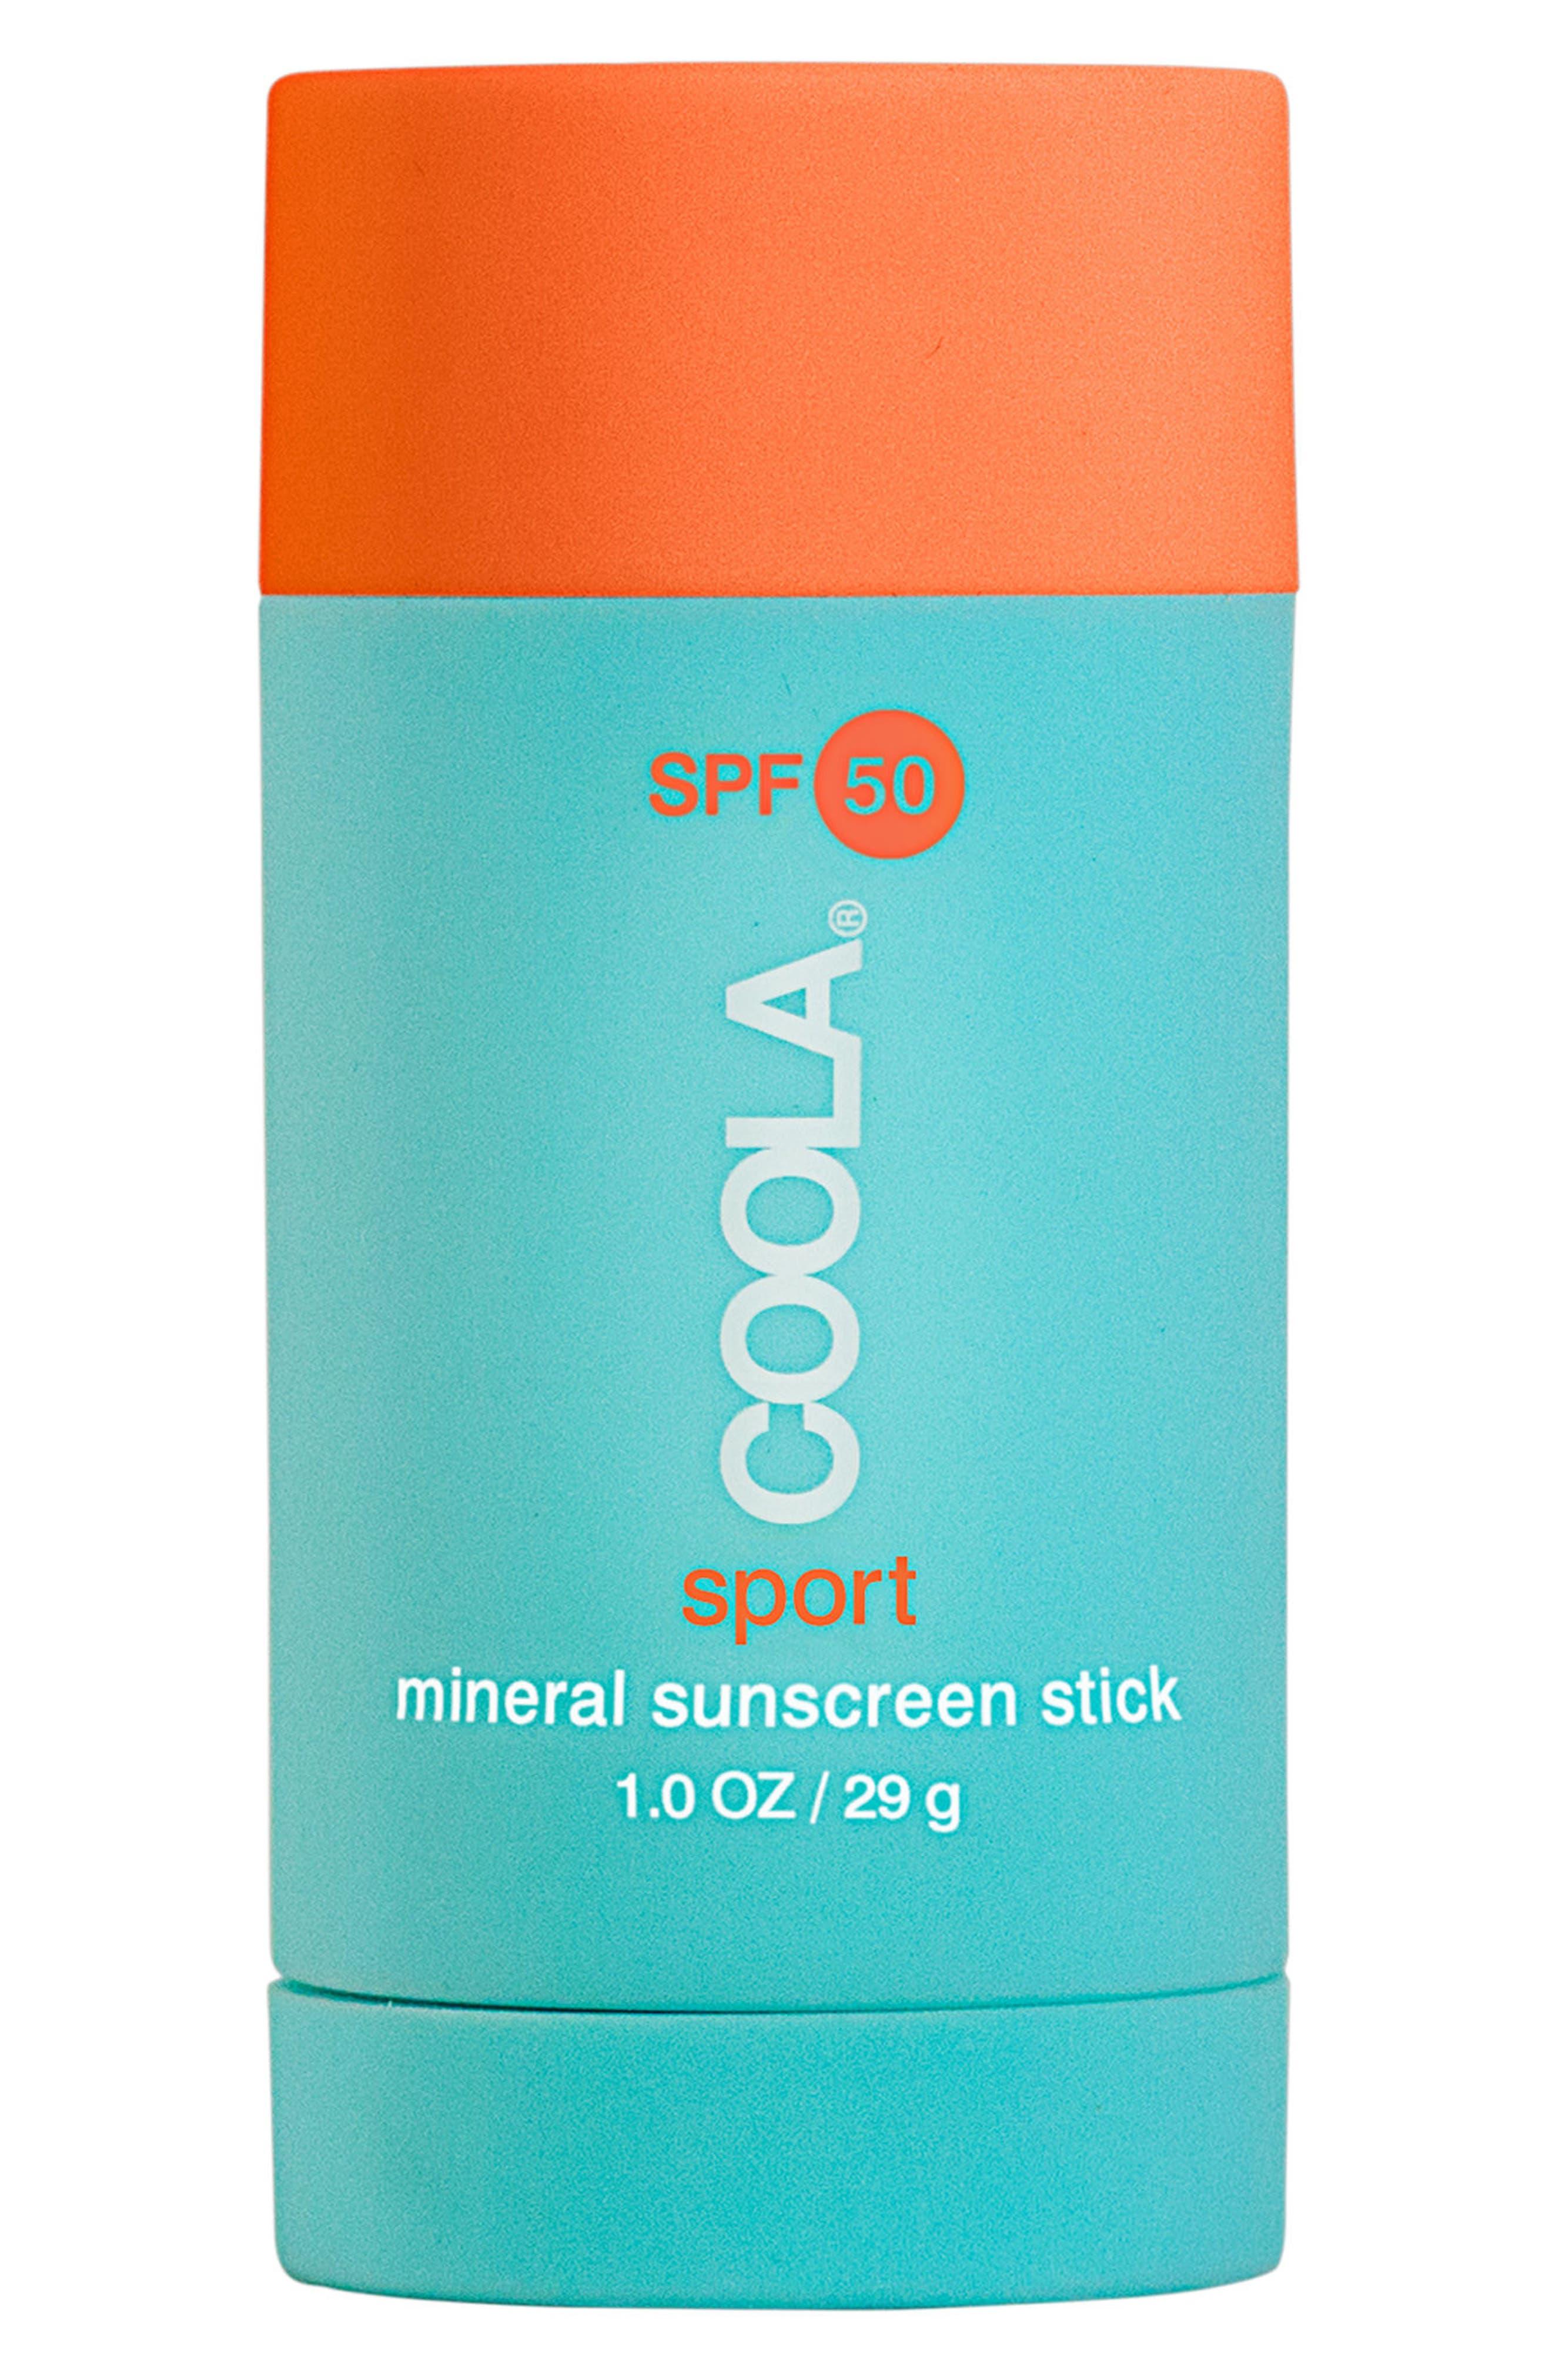 Coola Suncare Mineral Sport Sunscreen Stick Spf 50